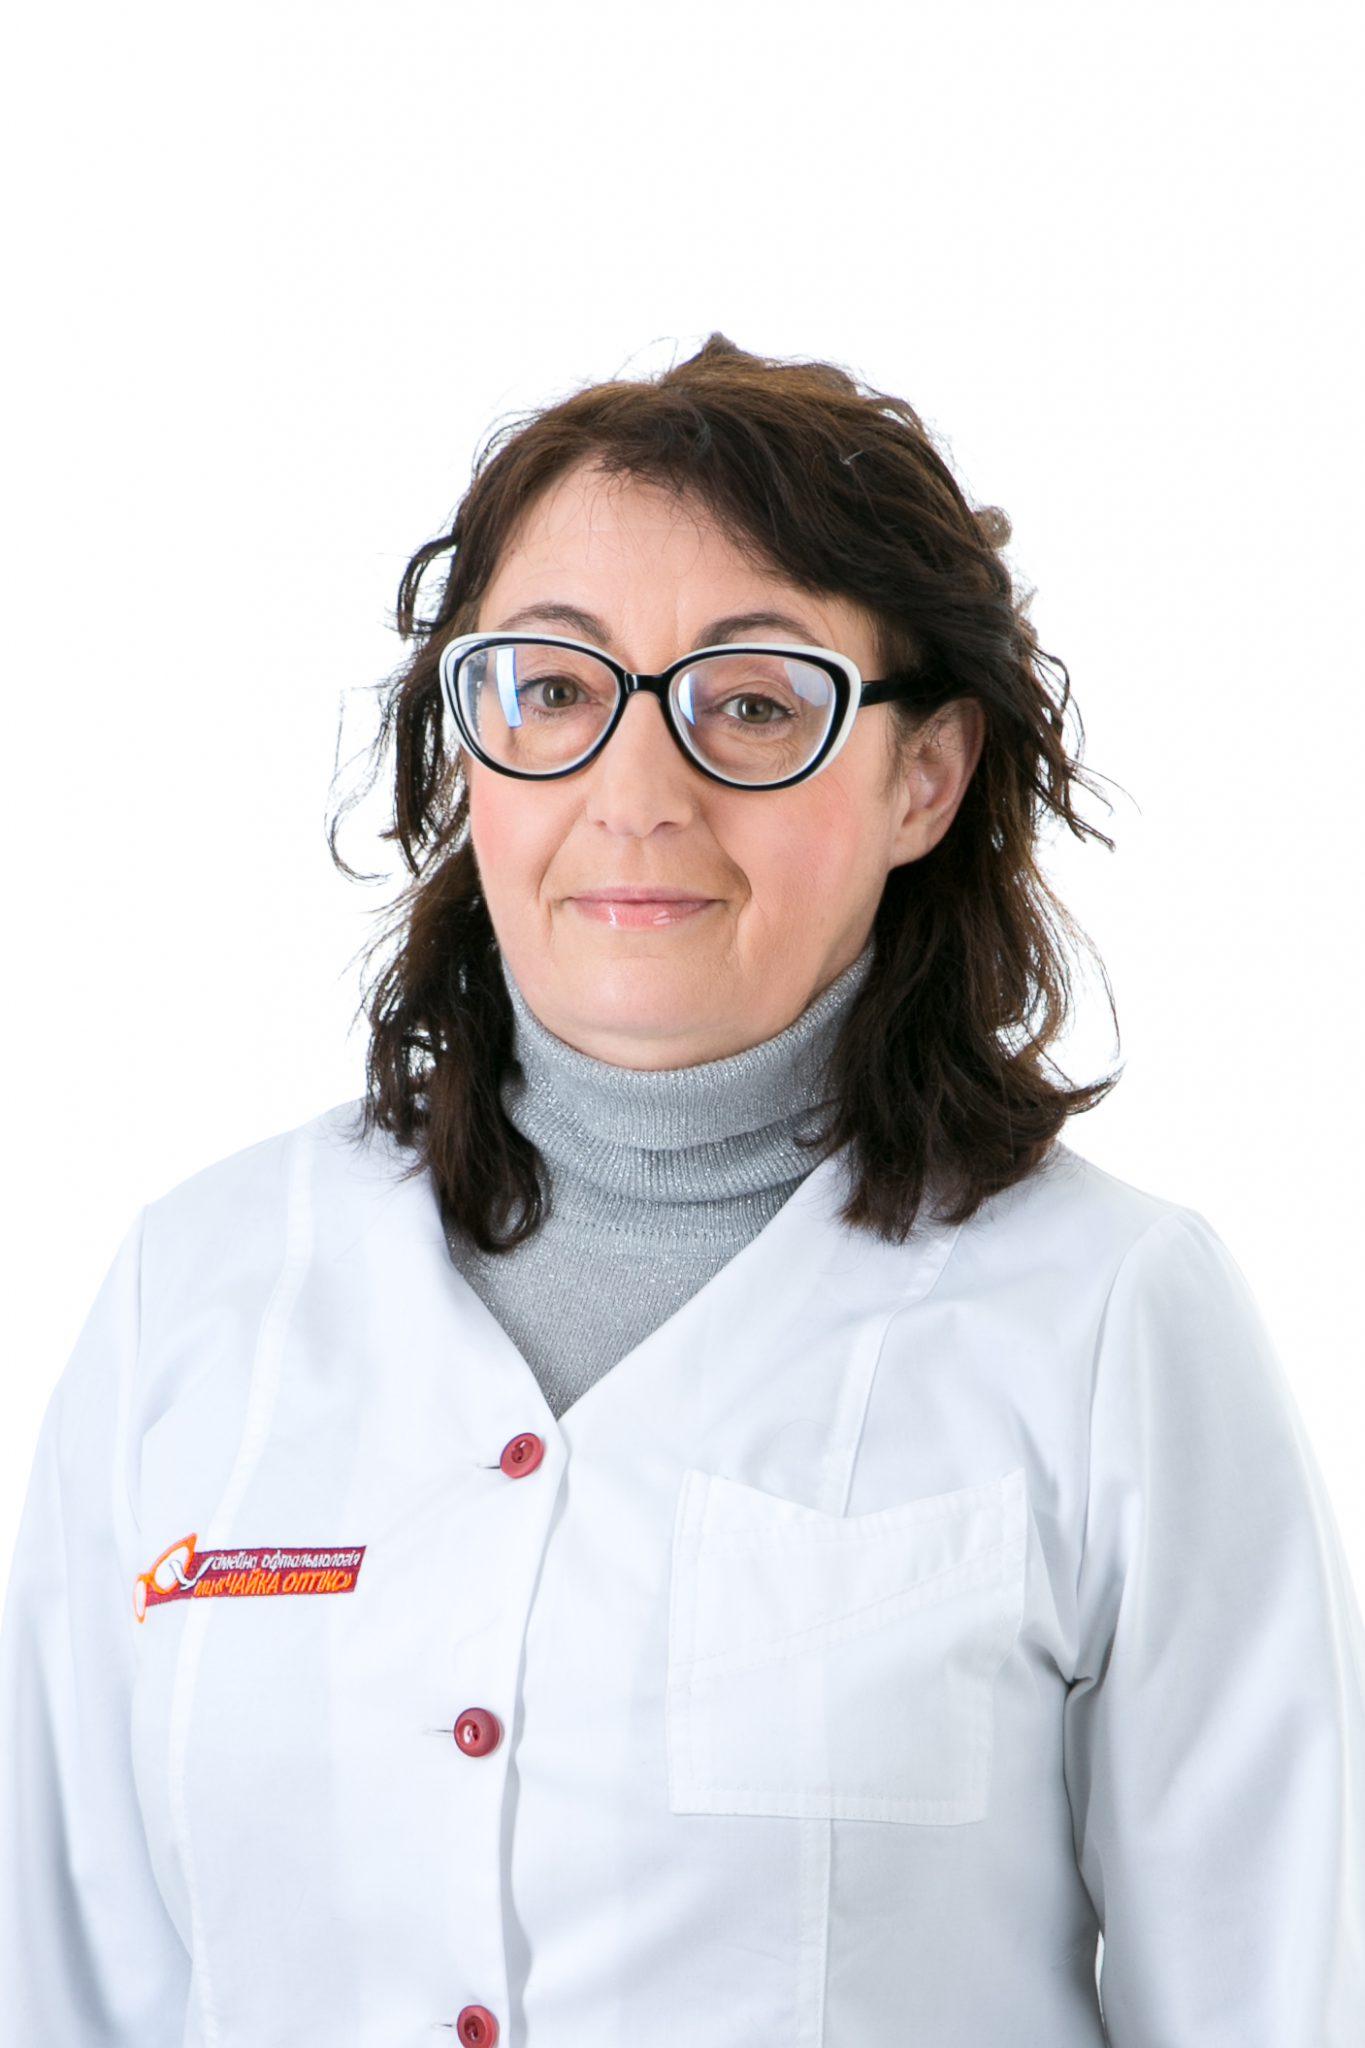 Петрусенко Олександра Юріївна